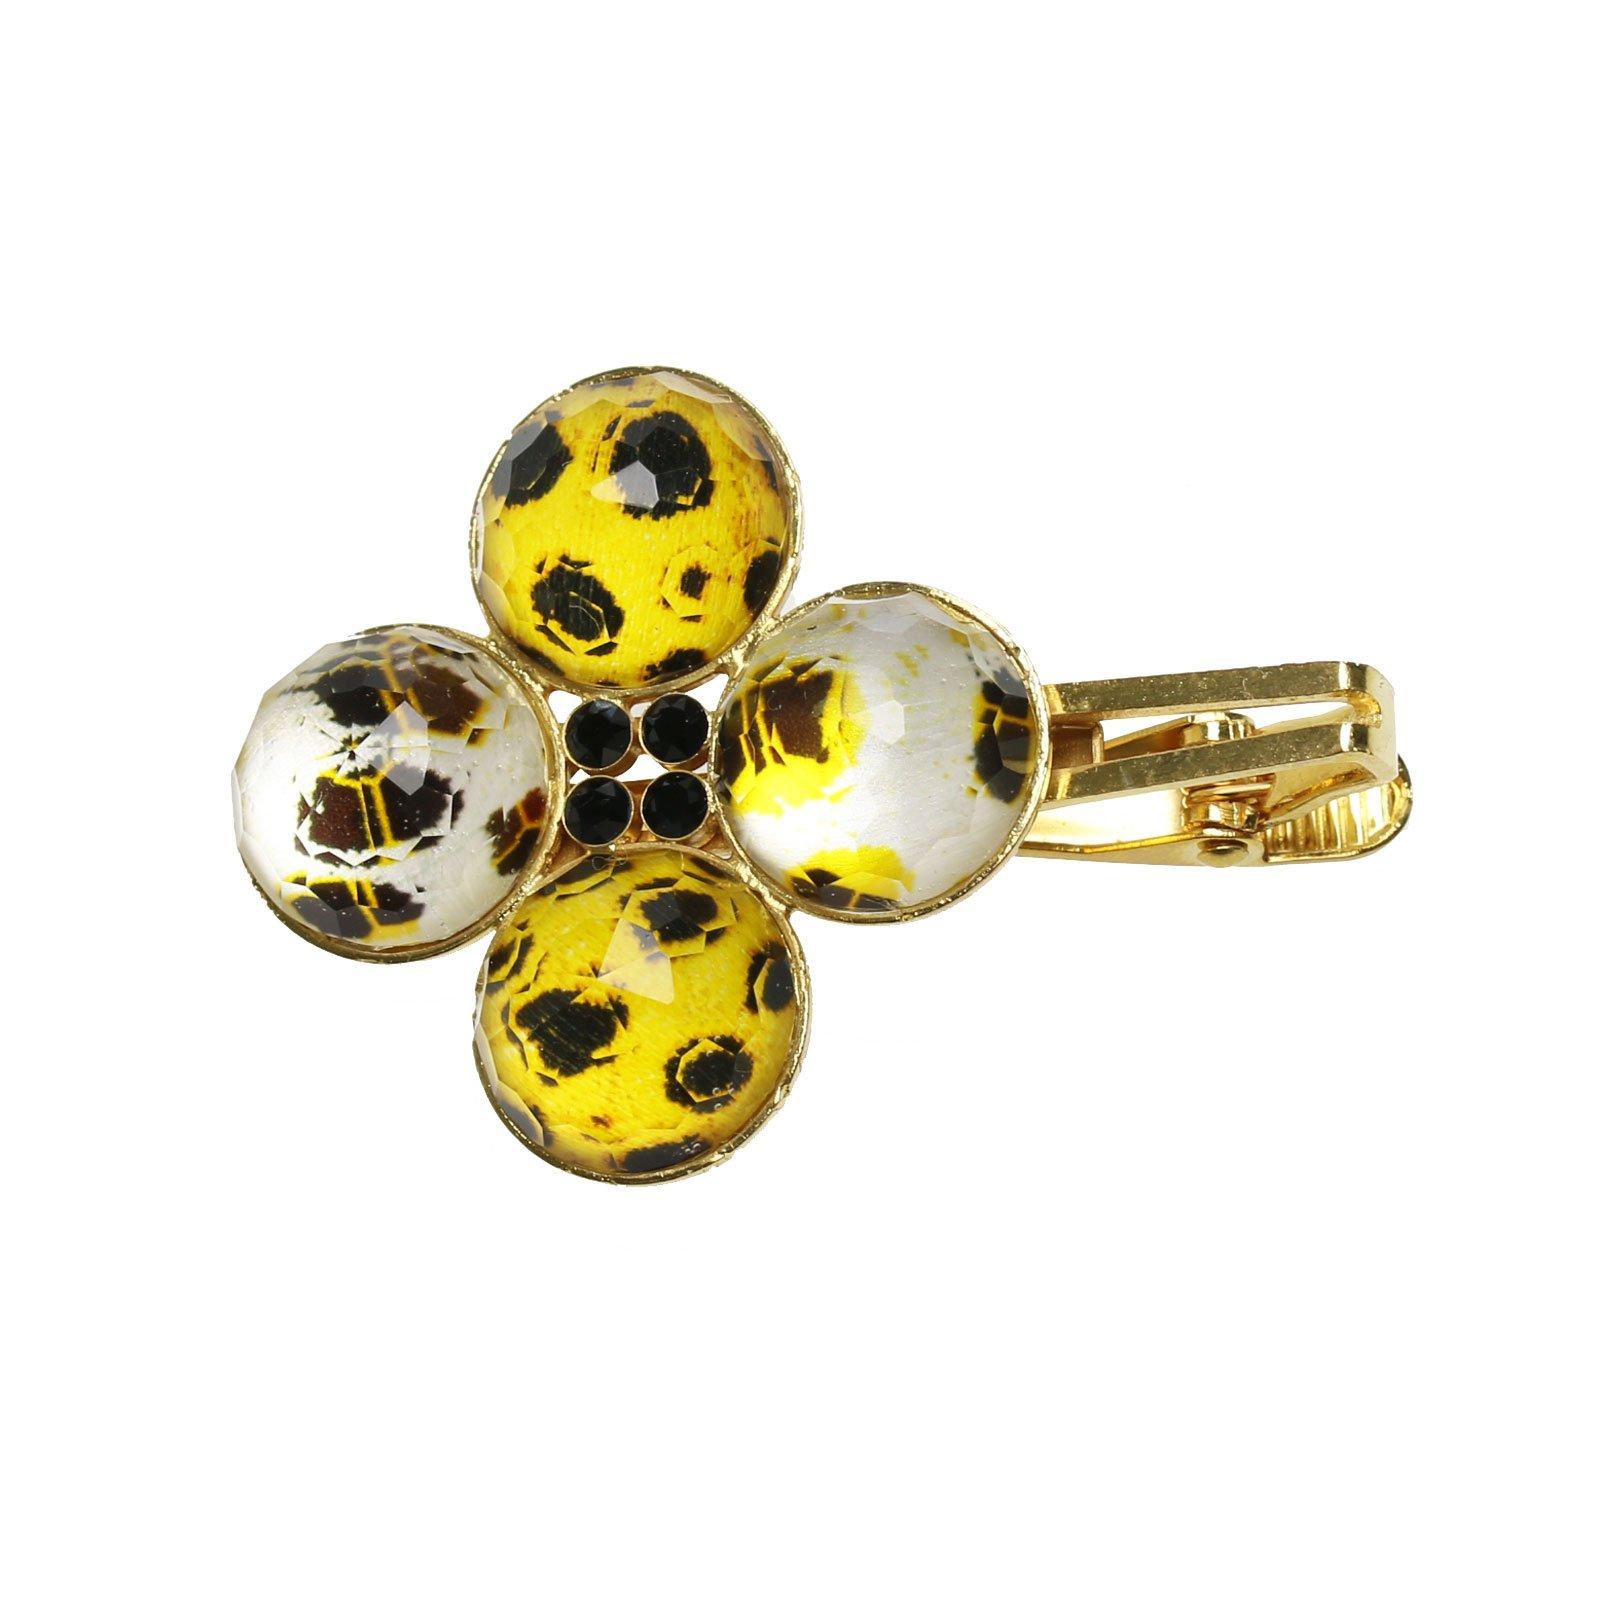 Tamarusan Shawl Clip Stole Clip Cheetah Tiger Cat Gold Brooch